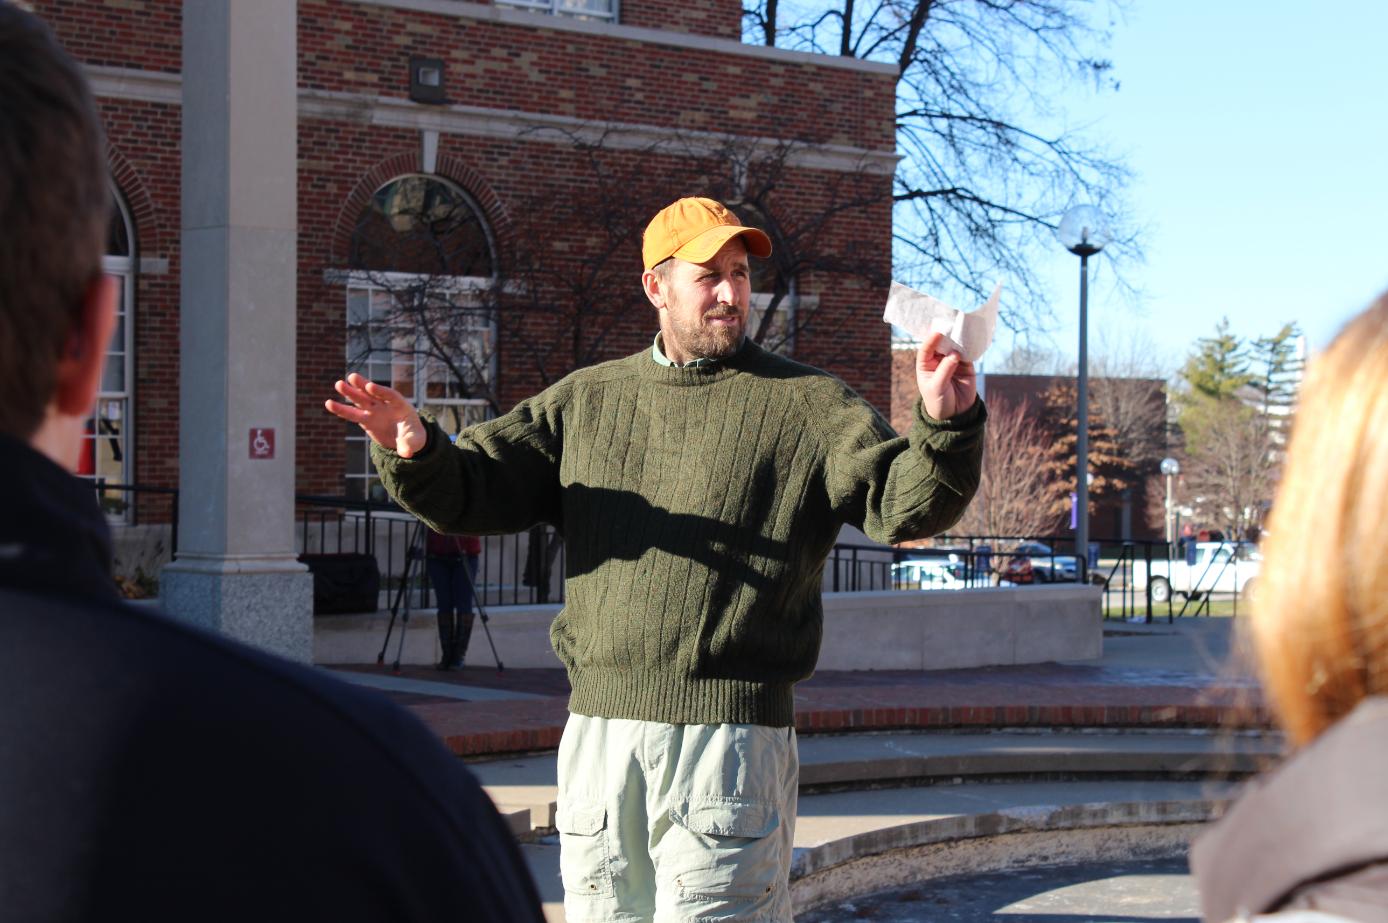 Ethan Hughes speaks prior to the march. Jonah McKeown/TMN Digital